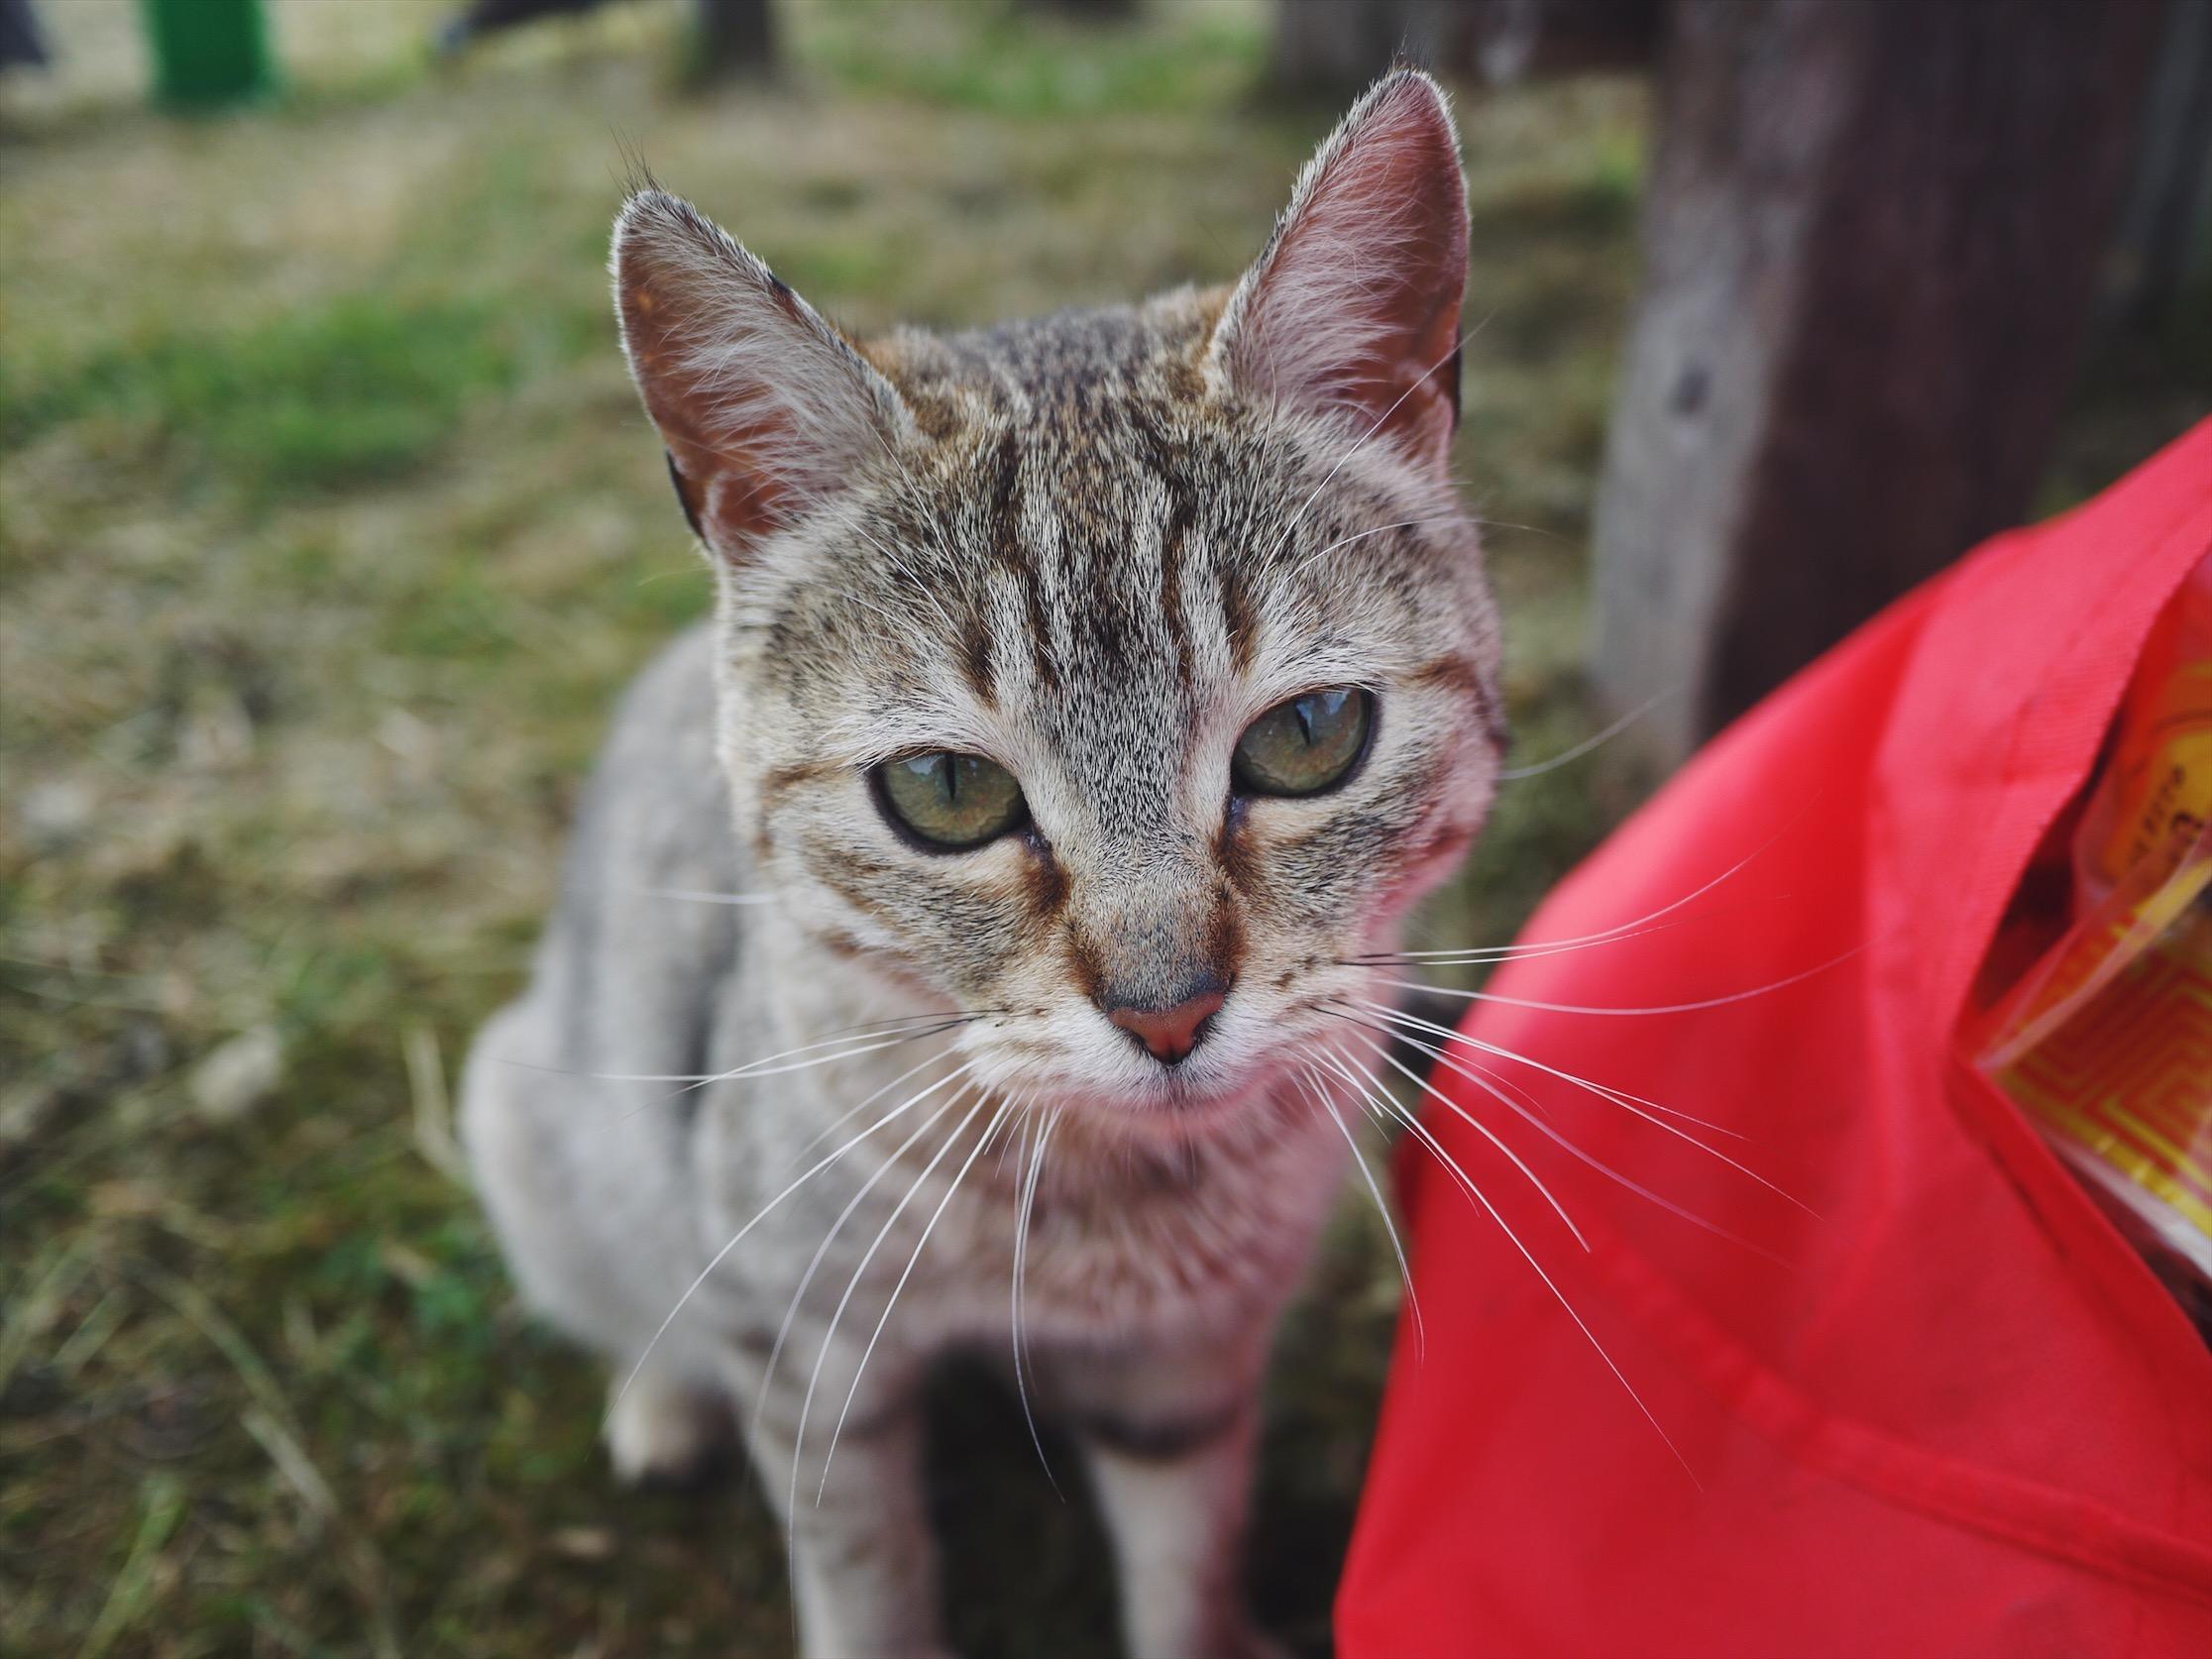 Camp cat, Pumpernickel.